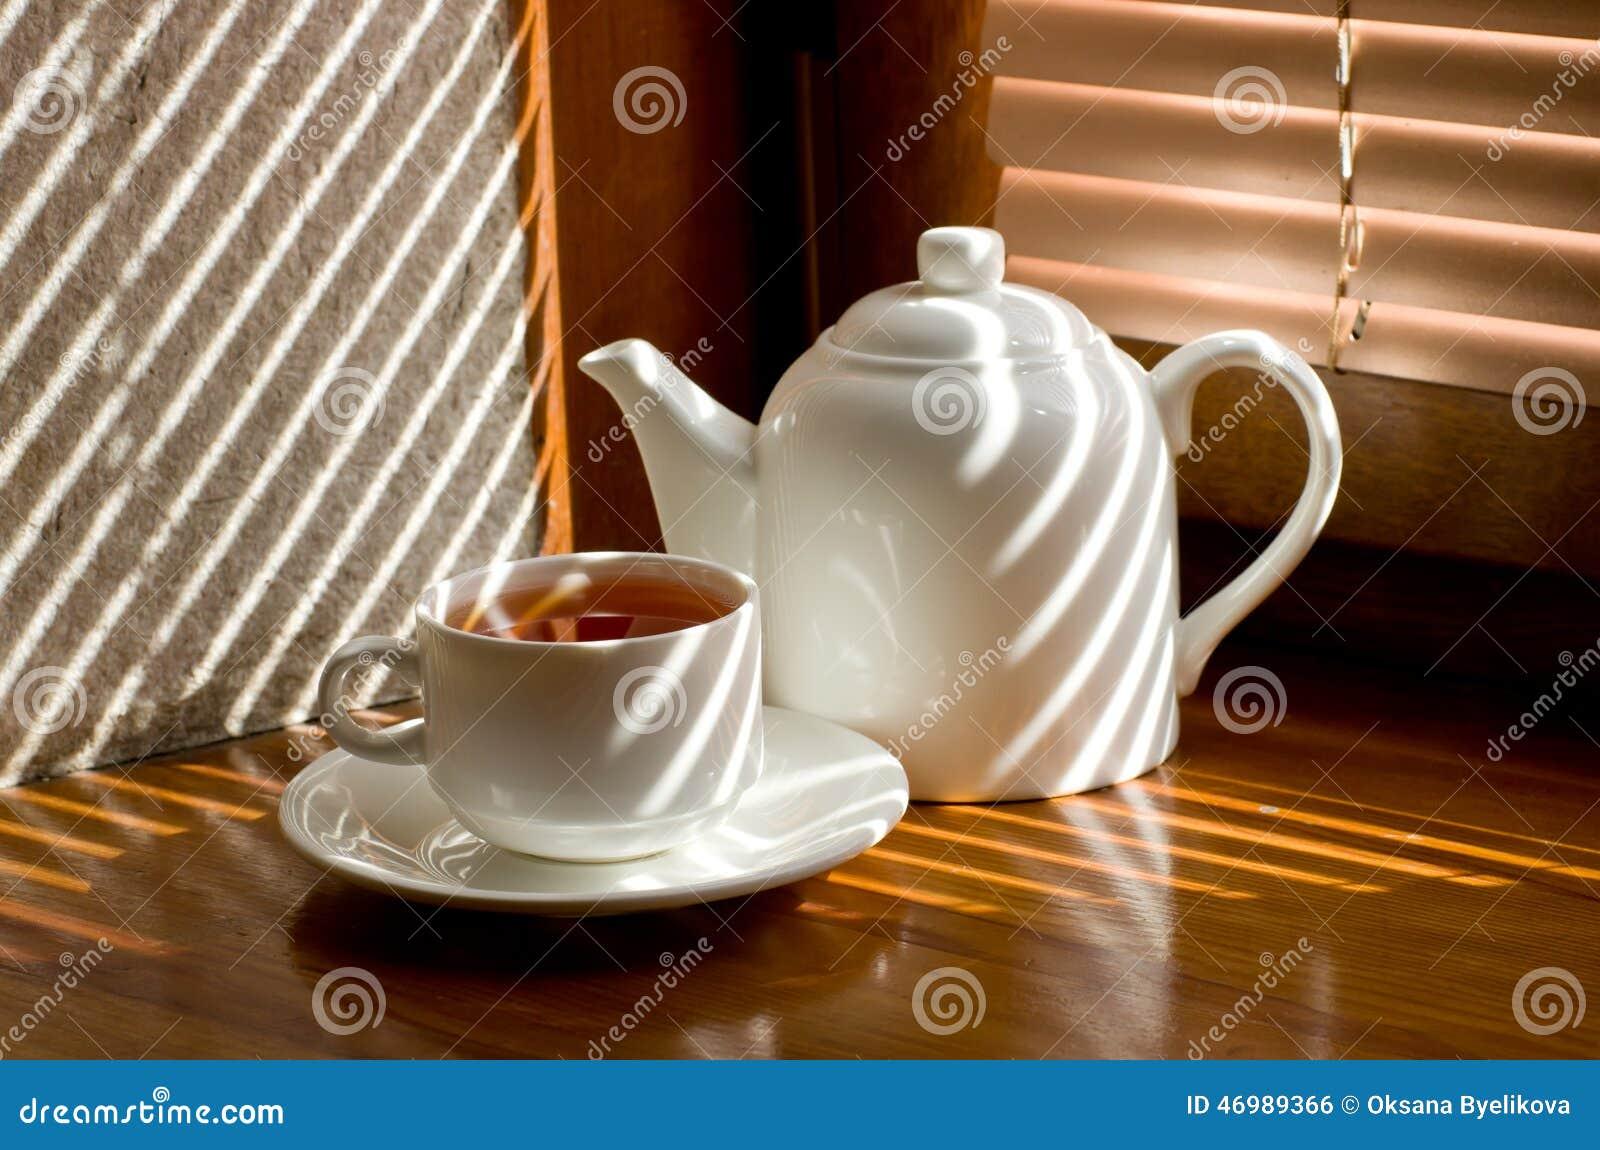 tasse de th avec la th i re photo stock image 46989366. Black Bedroom Furniture Sets. Home Design Ideas